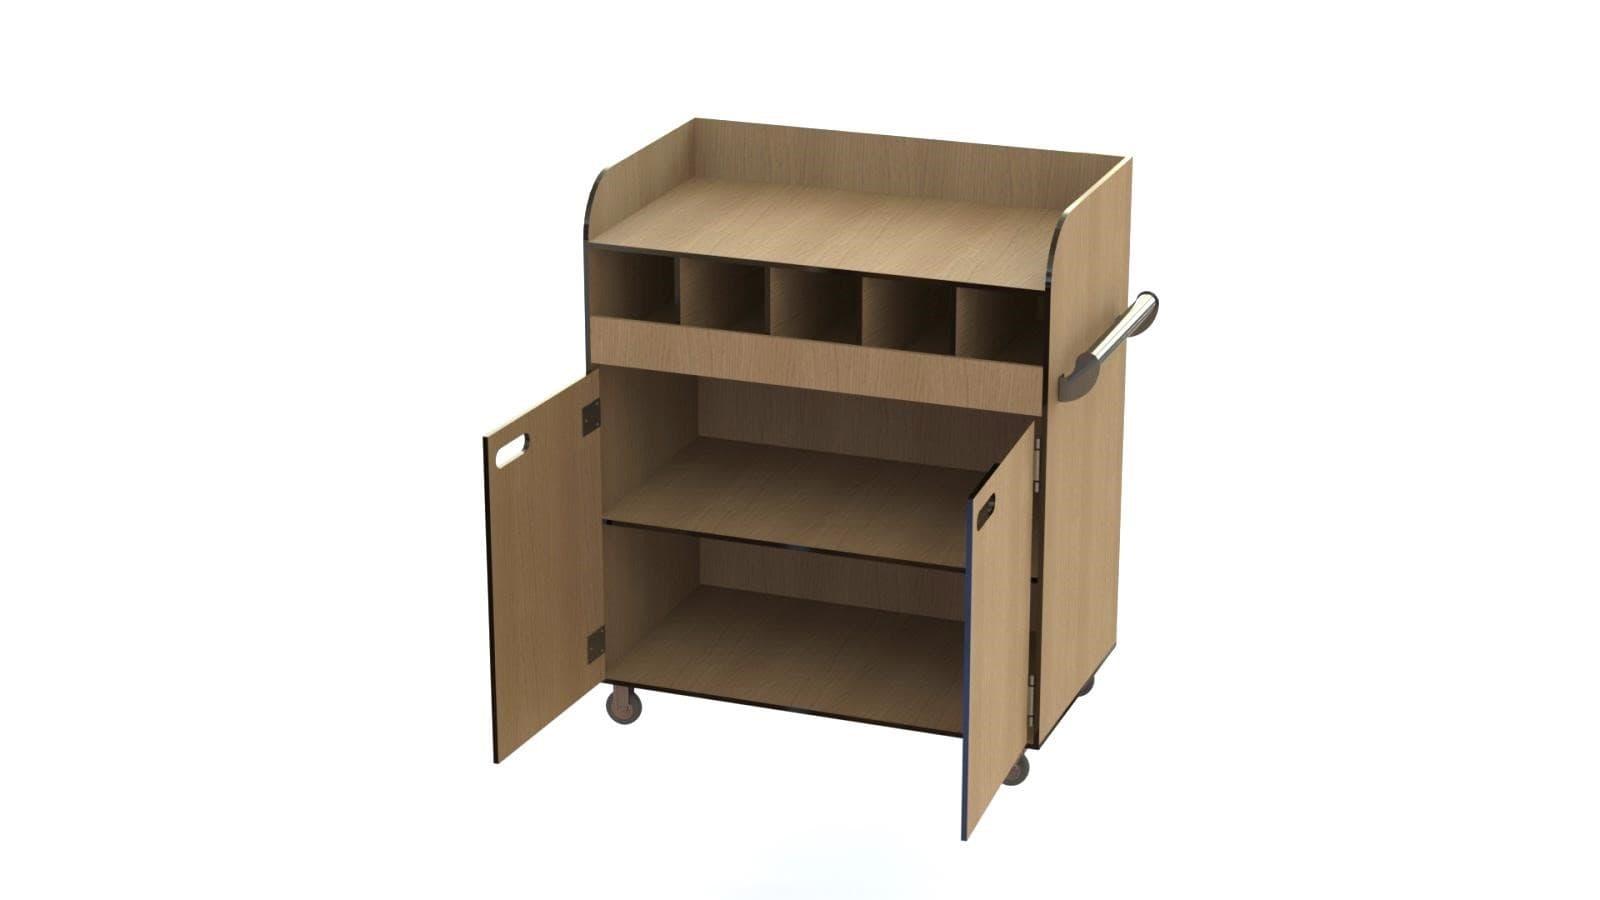 Acheter votre mobilier de restauration en ligne euroterrasse - Achat meubles en ligne ...